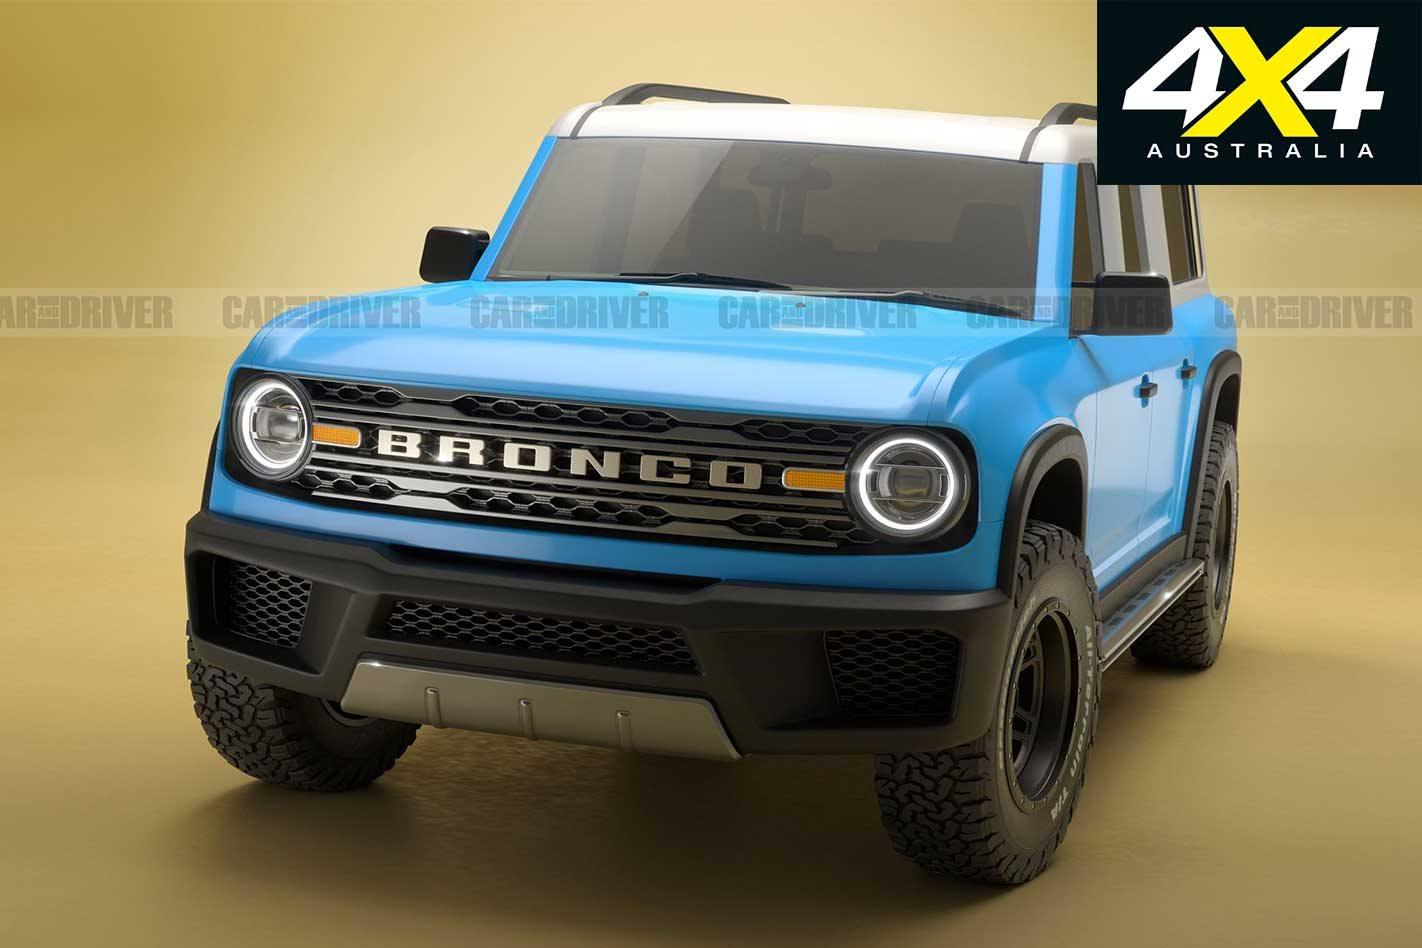 Latest Renderings Provide Best Look Yet At 2021 Ford Bronco